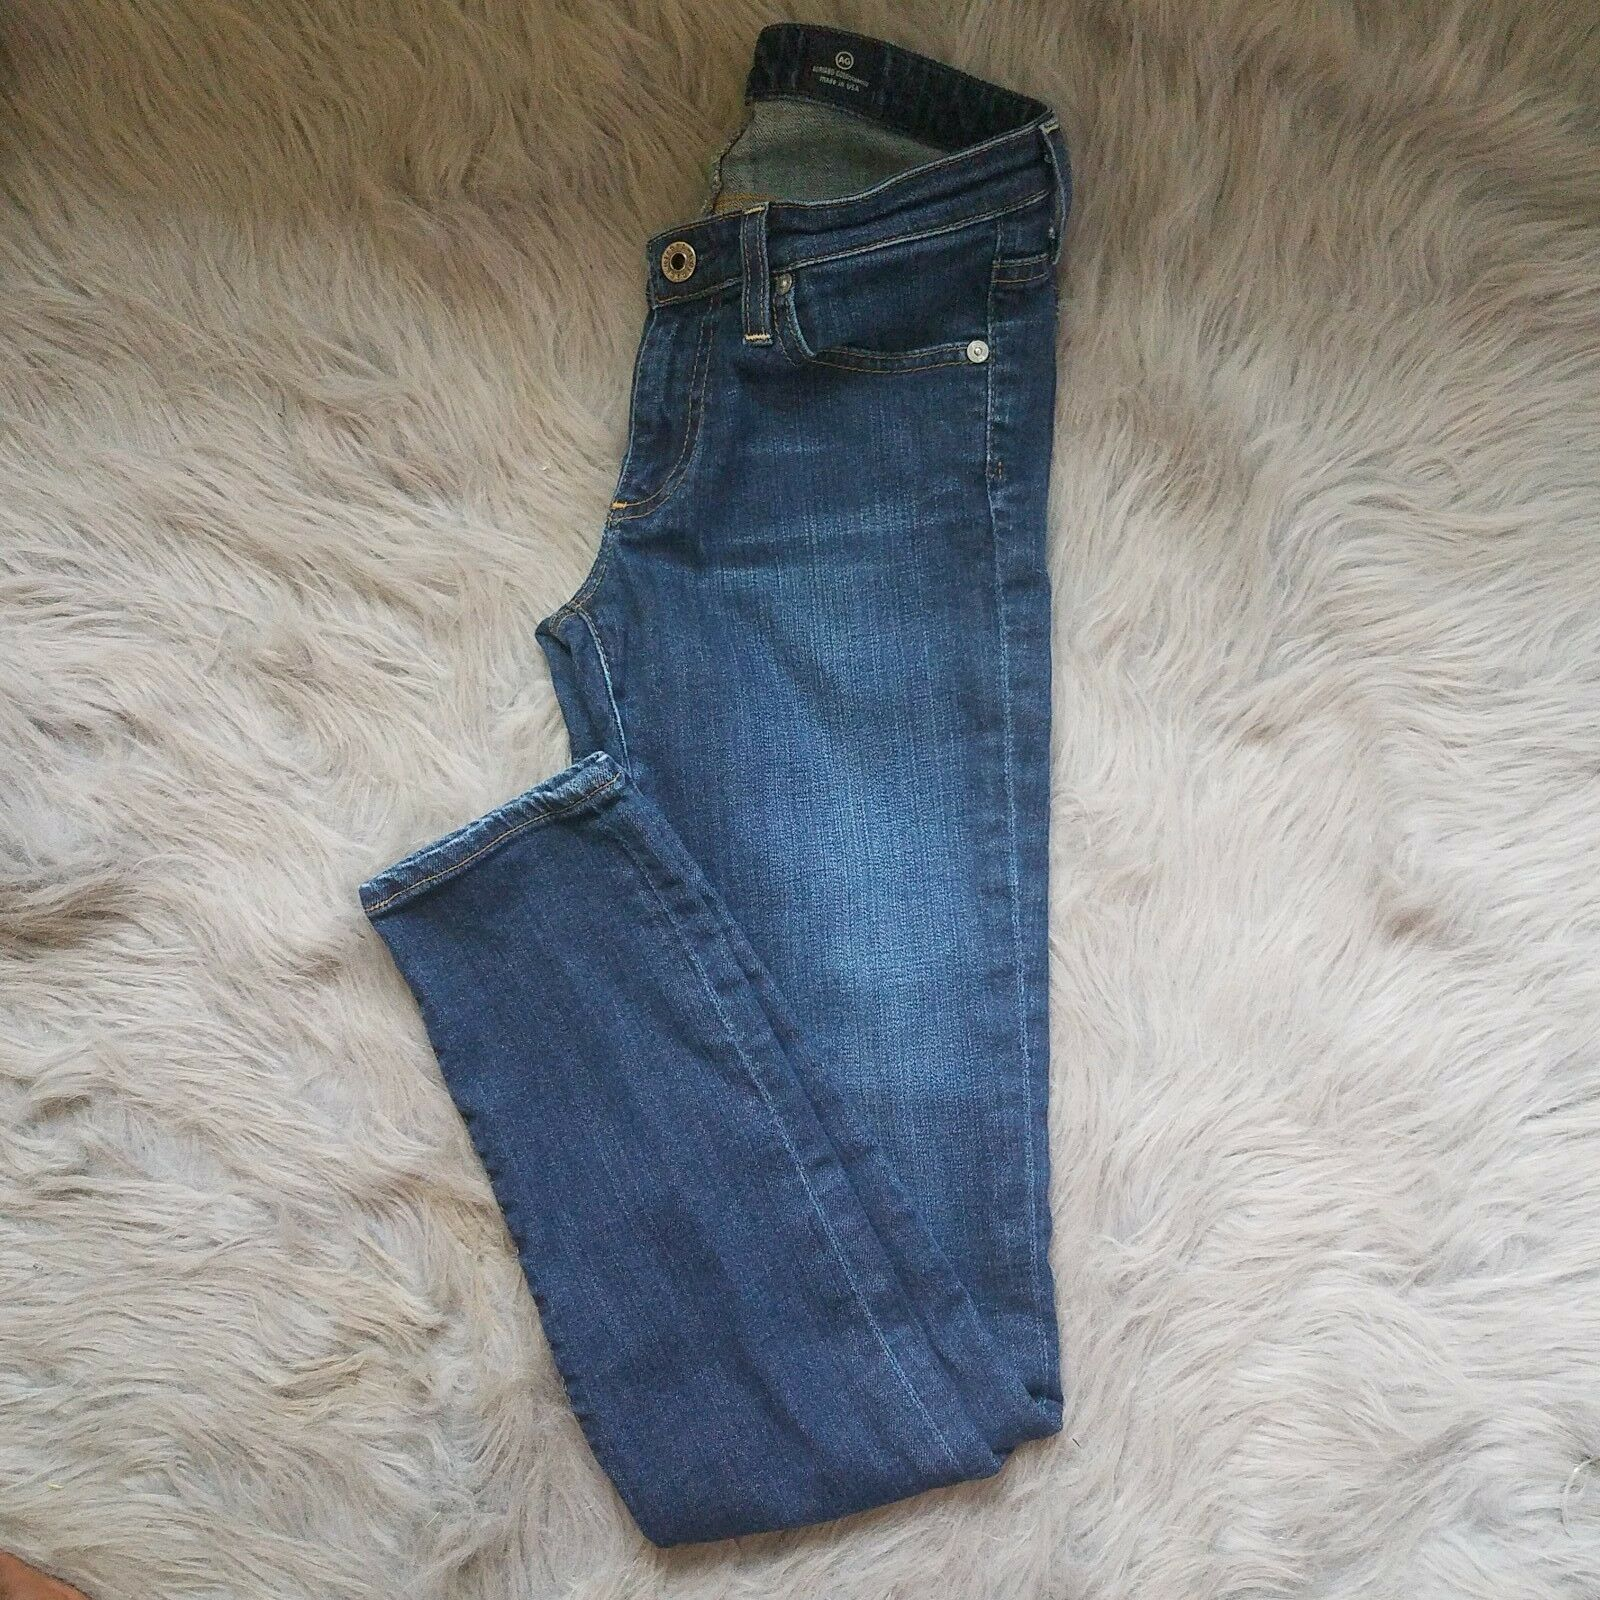 Adriano goldschmeid the stilt cigarette leg skinny jeans size 26